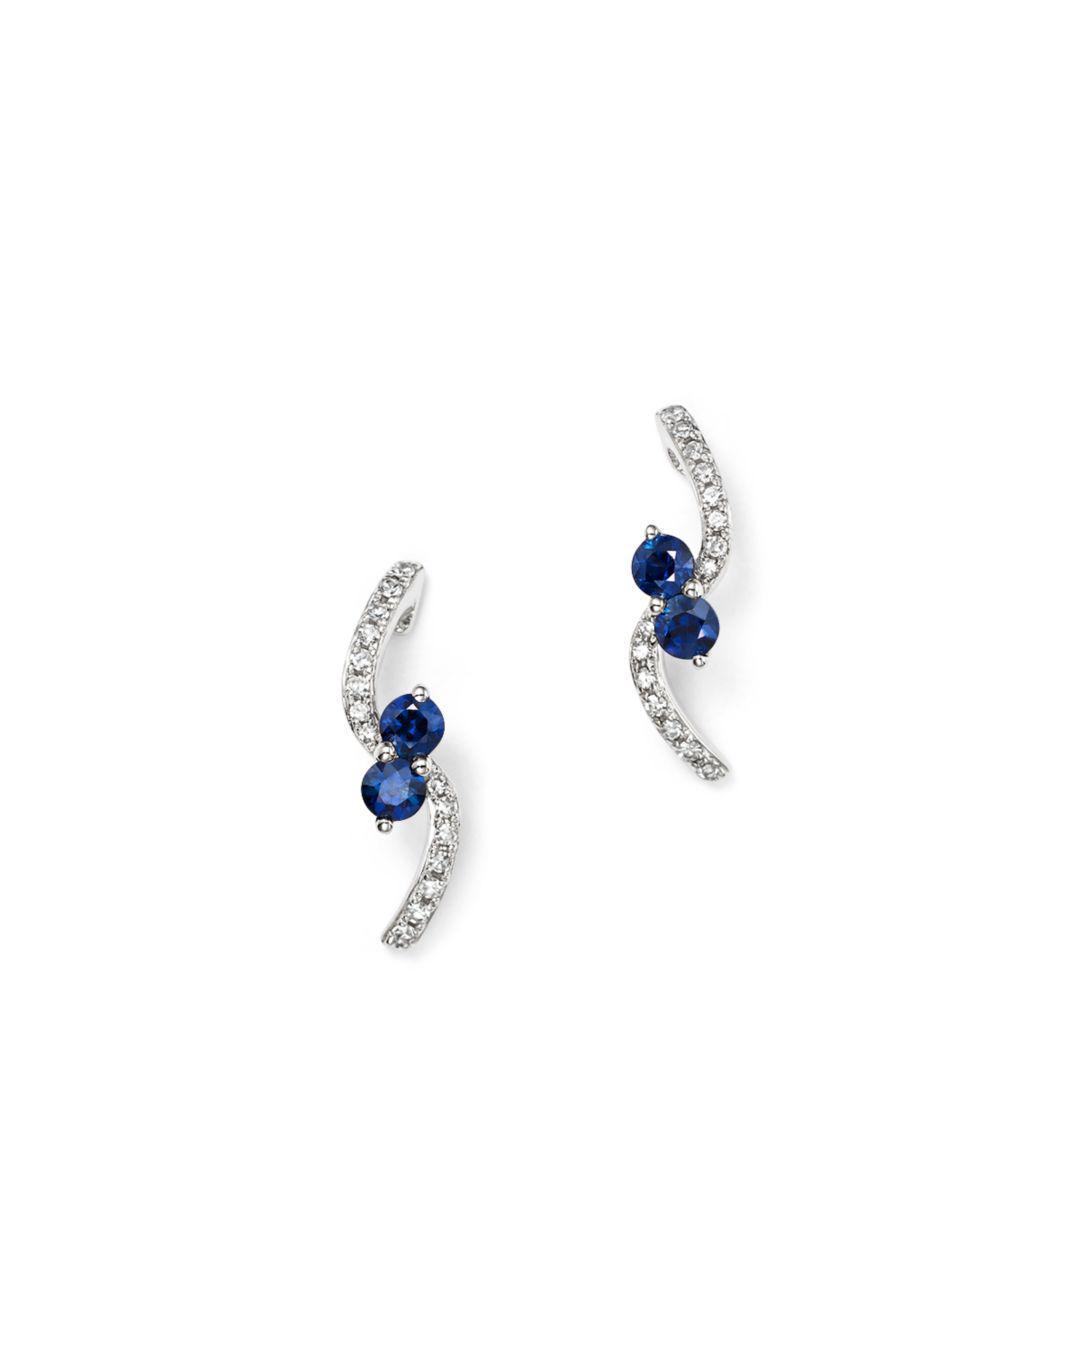 ba6af9237 Gallery. Previously sold at: Bloomingdale's · Women's Diamond Earrings